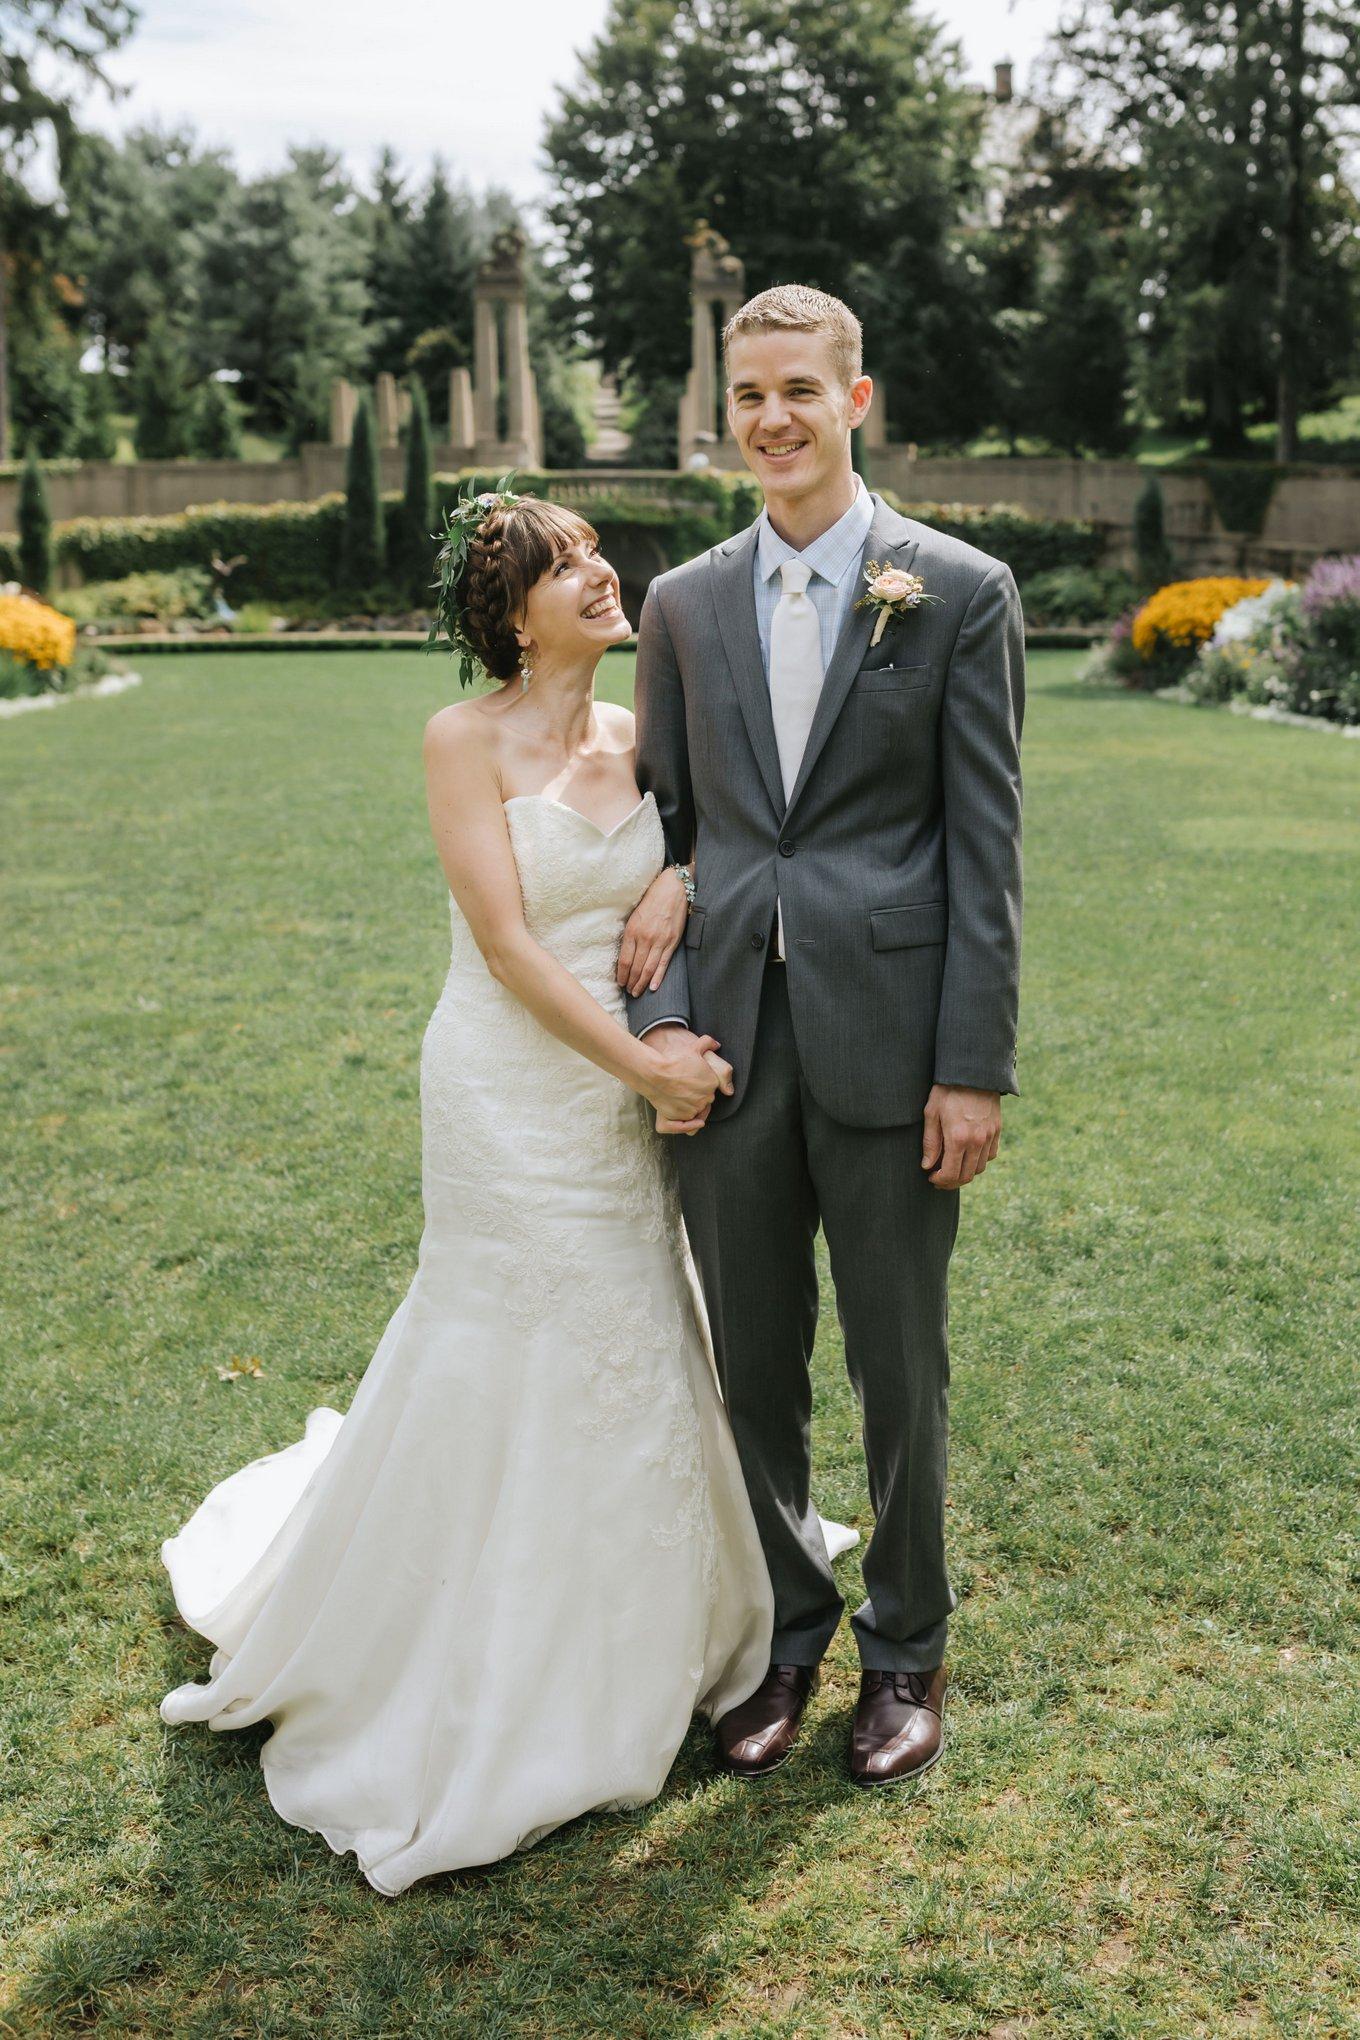 Crane-Estate-Vow-Renewal-Wedding-9.JPG